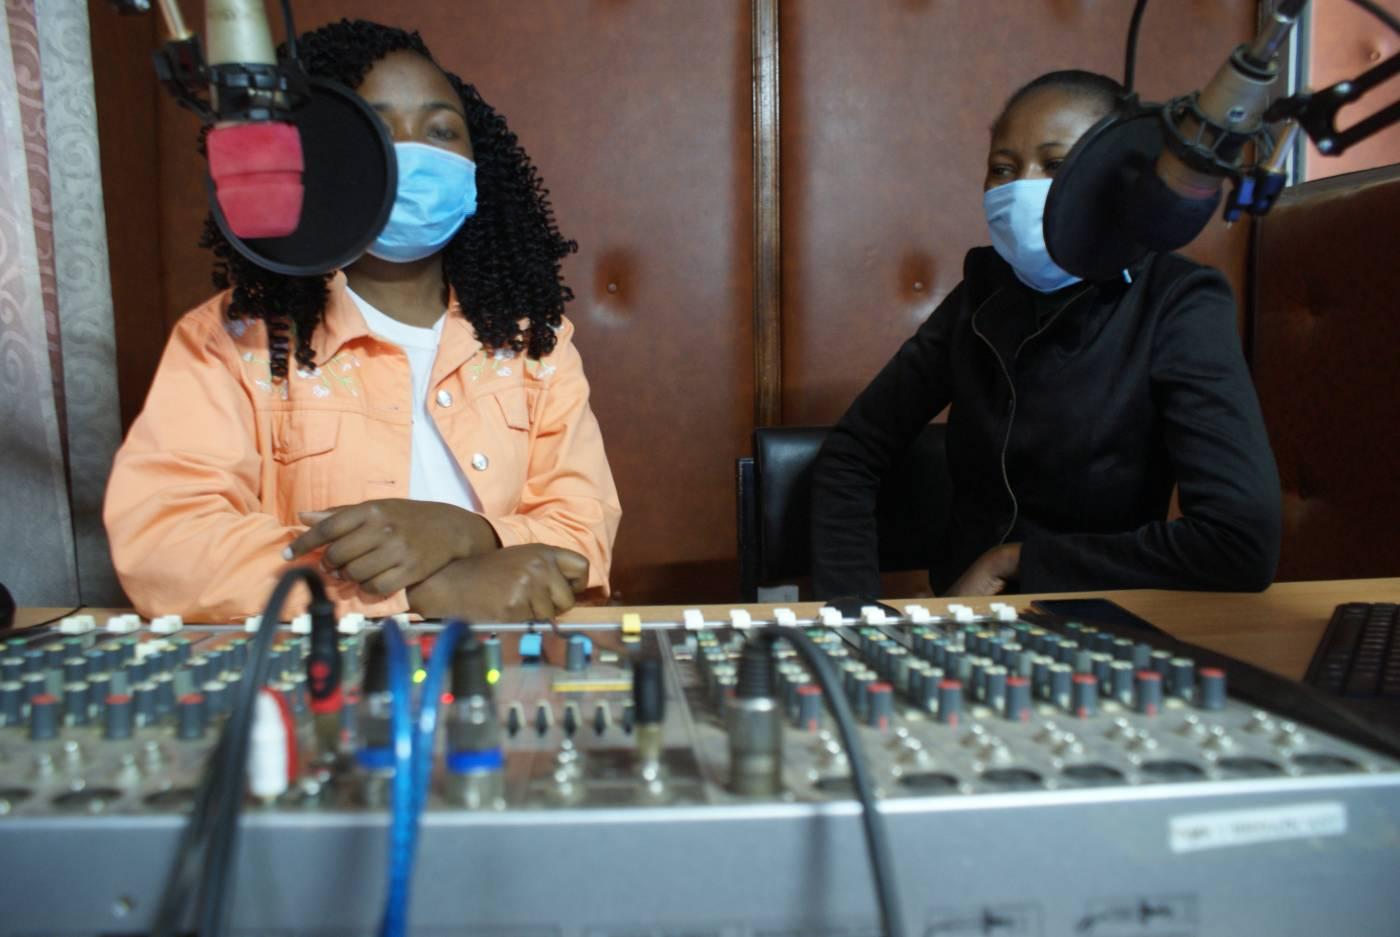 Weather alerts at risk as Kenya's radio stations struggle amid virus downturn - TheDispatch